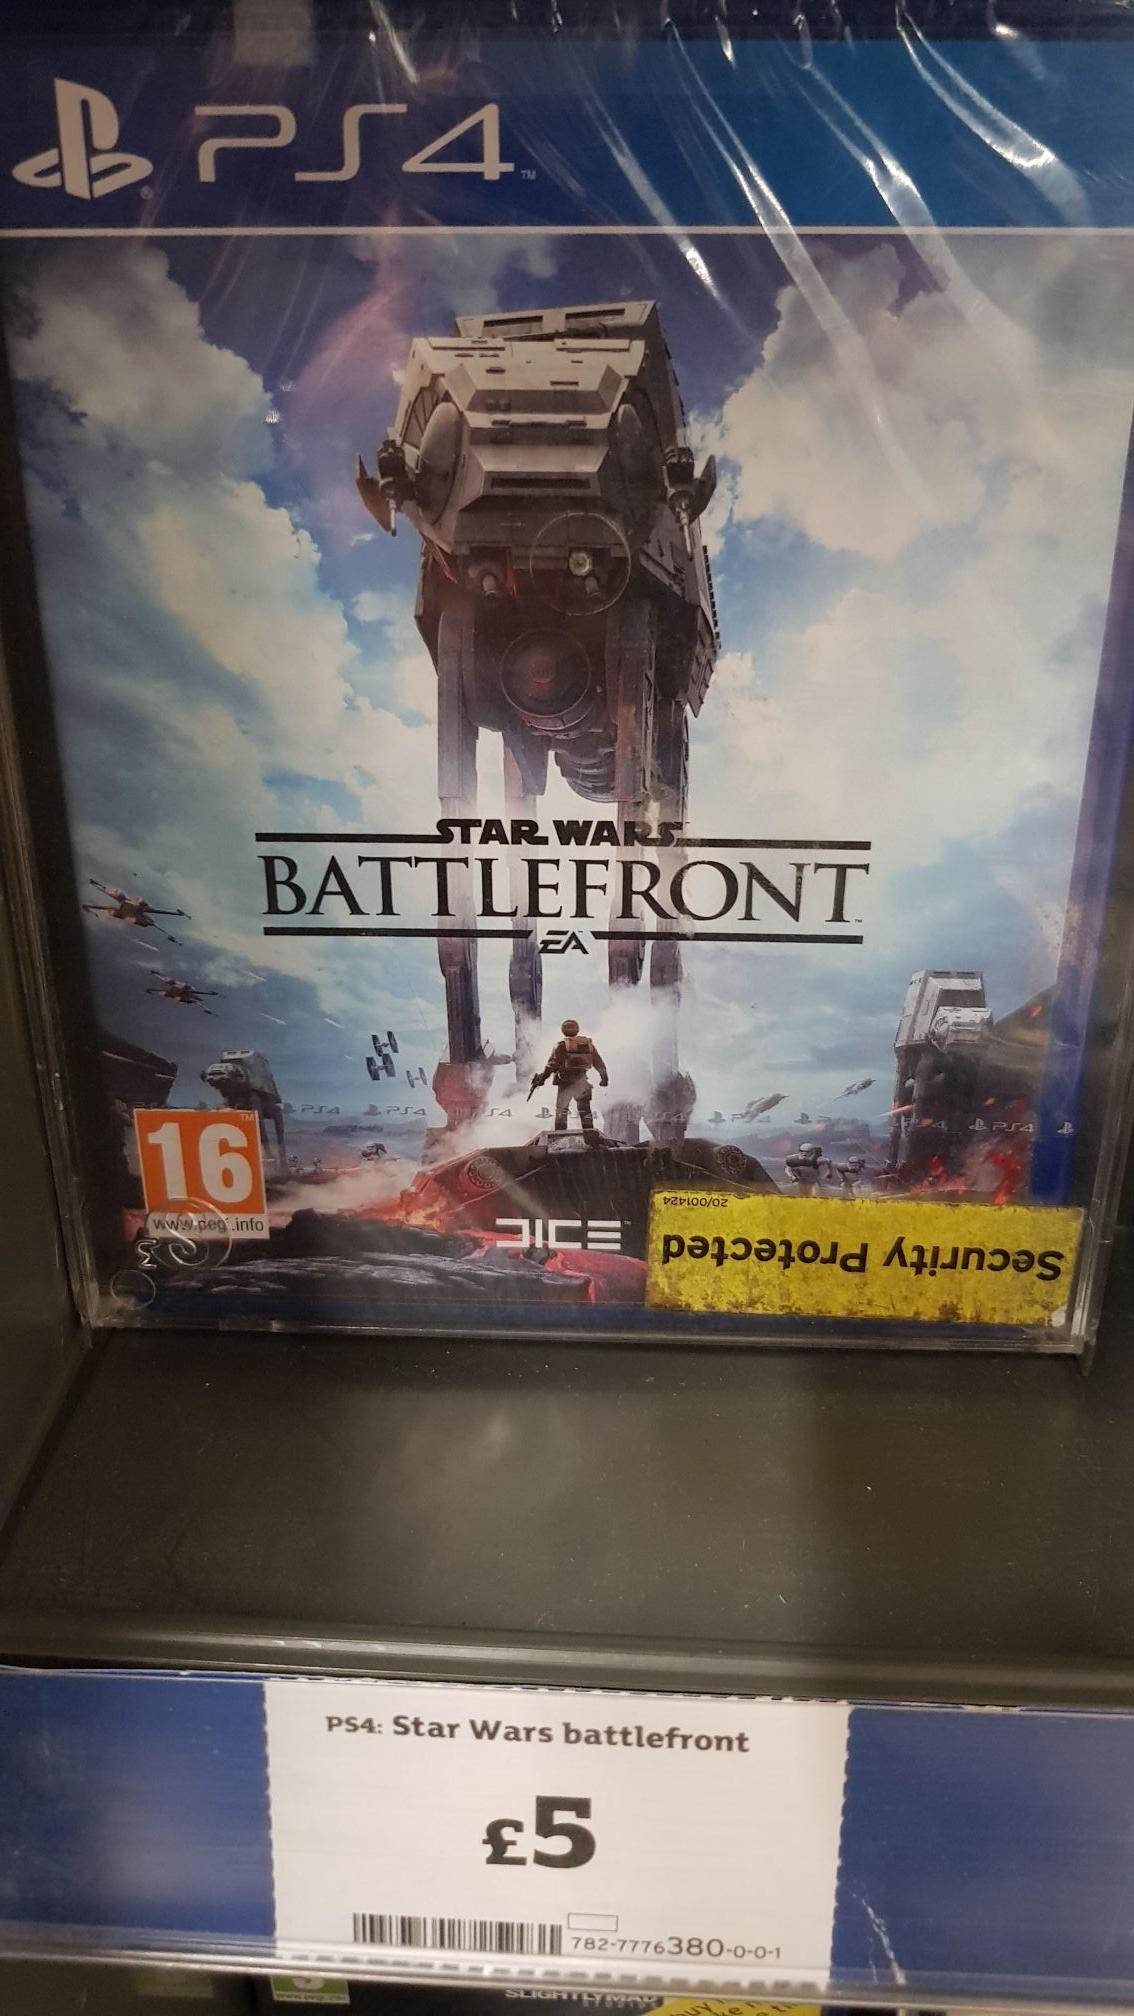 Star Wars Battlefront PS4 £5 @ Sainsbury's - Stirling